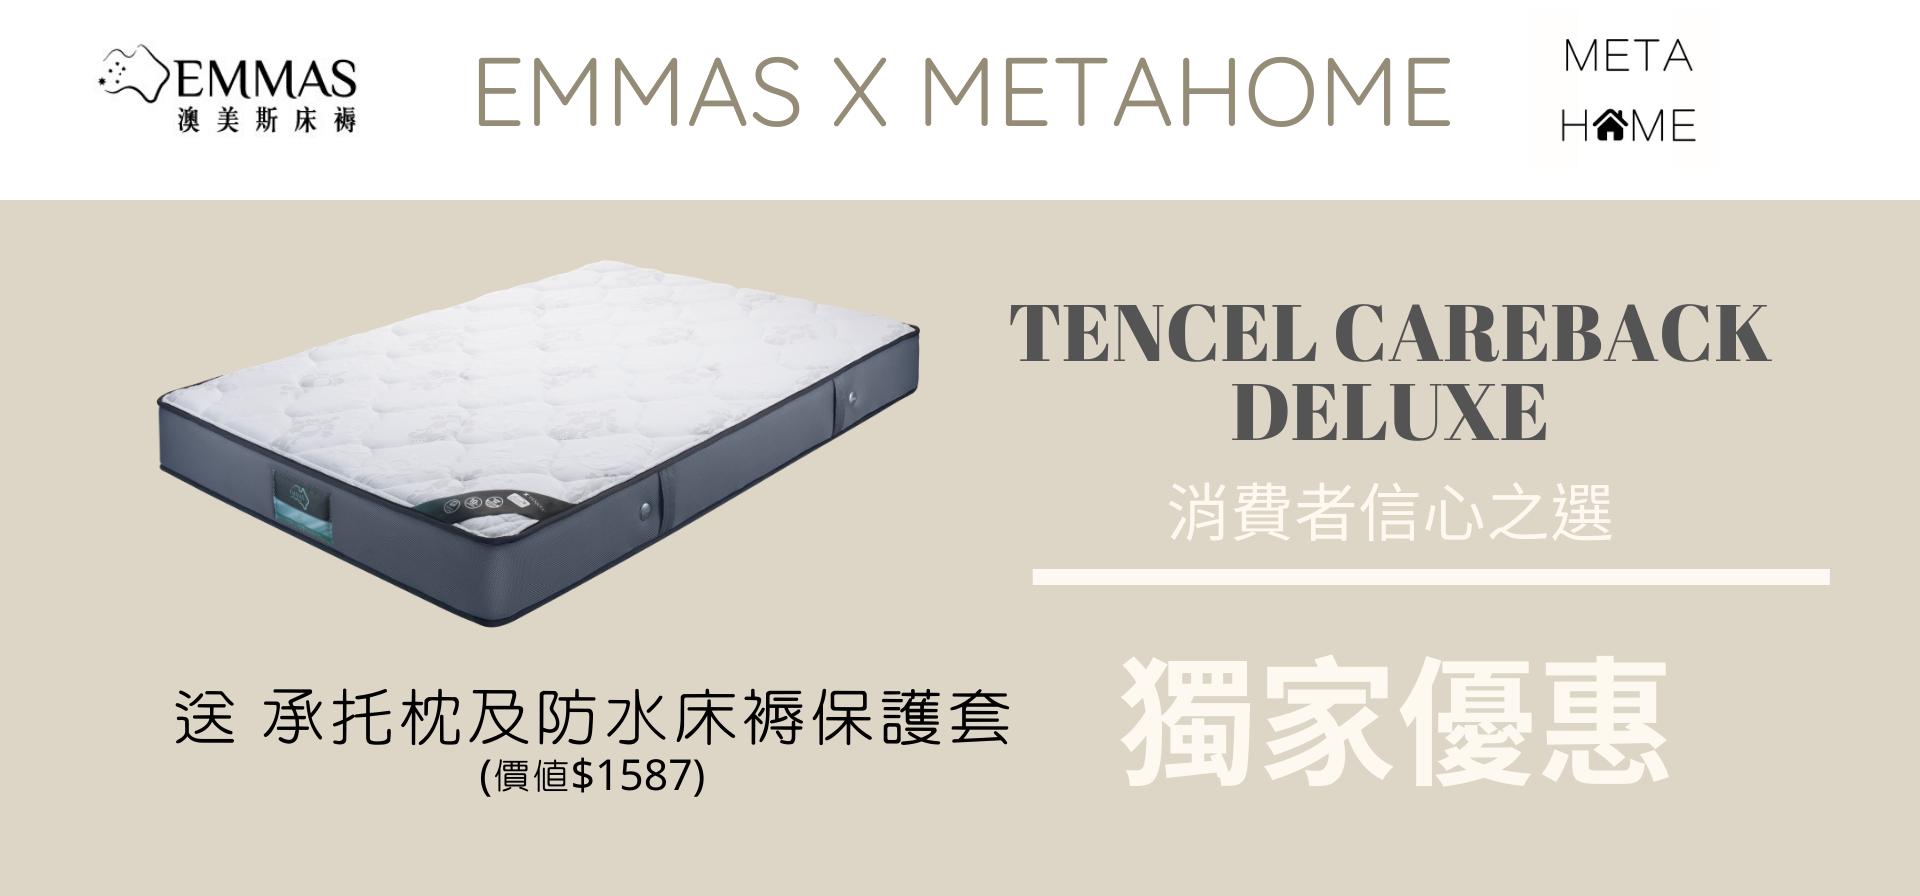 Tencel Careback Deluxe EMMAS天絲護脊床褥